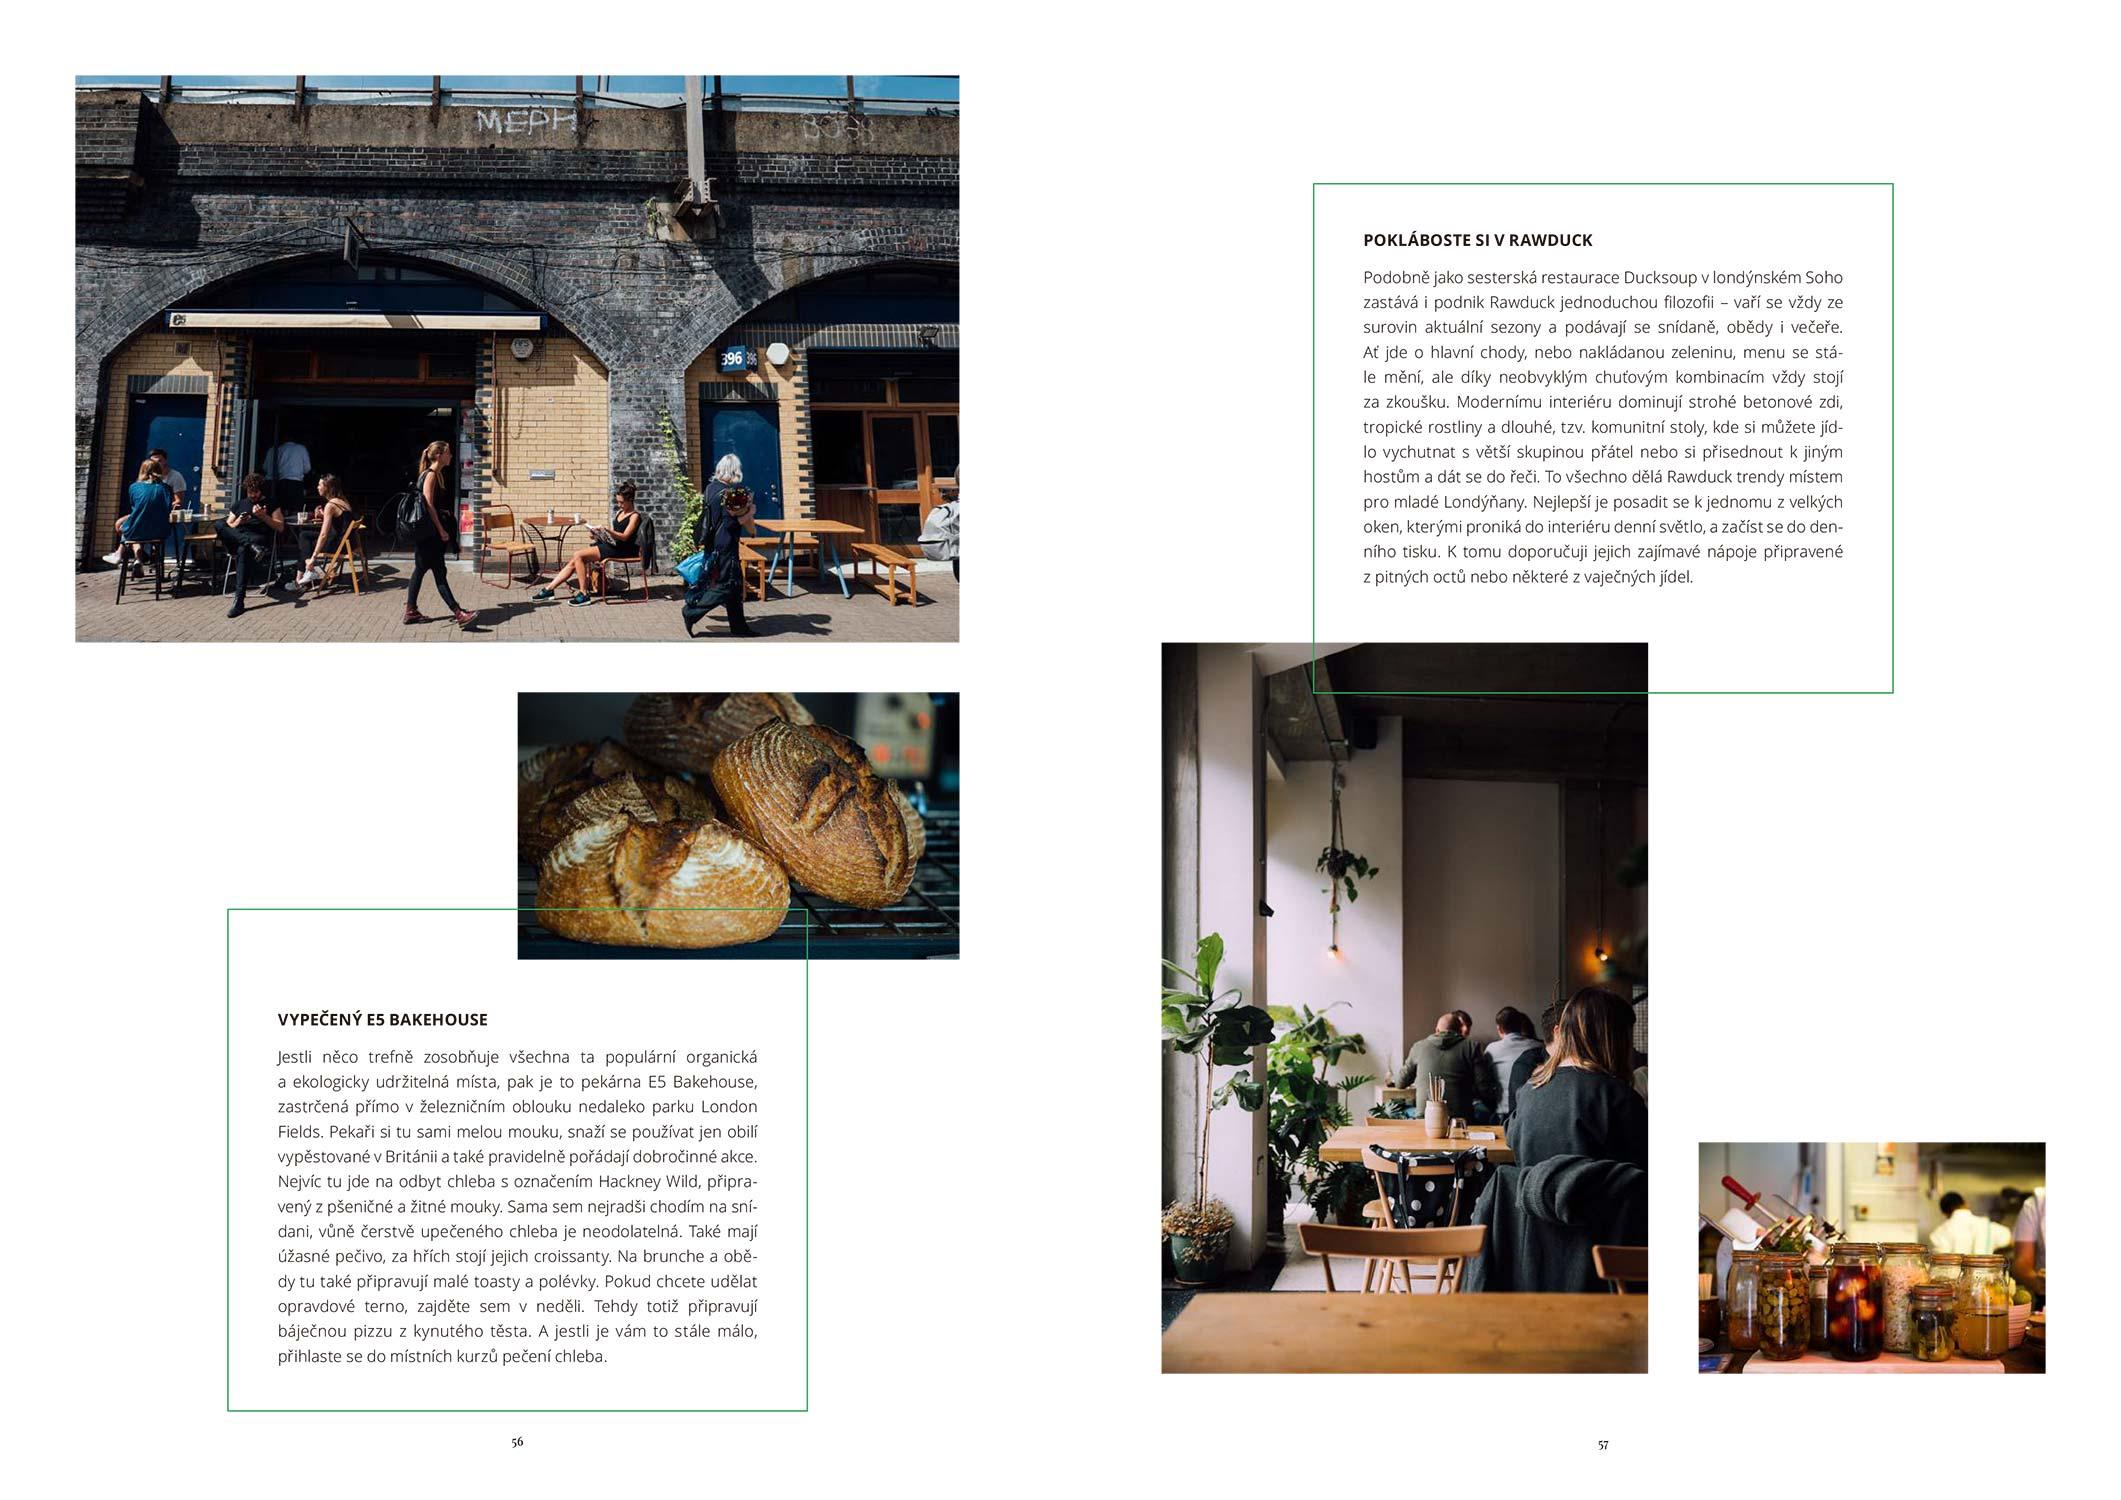 MonicaRGoya-Hackney-City-Guide-2.jpg